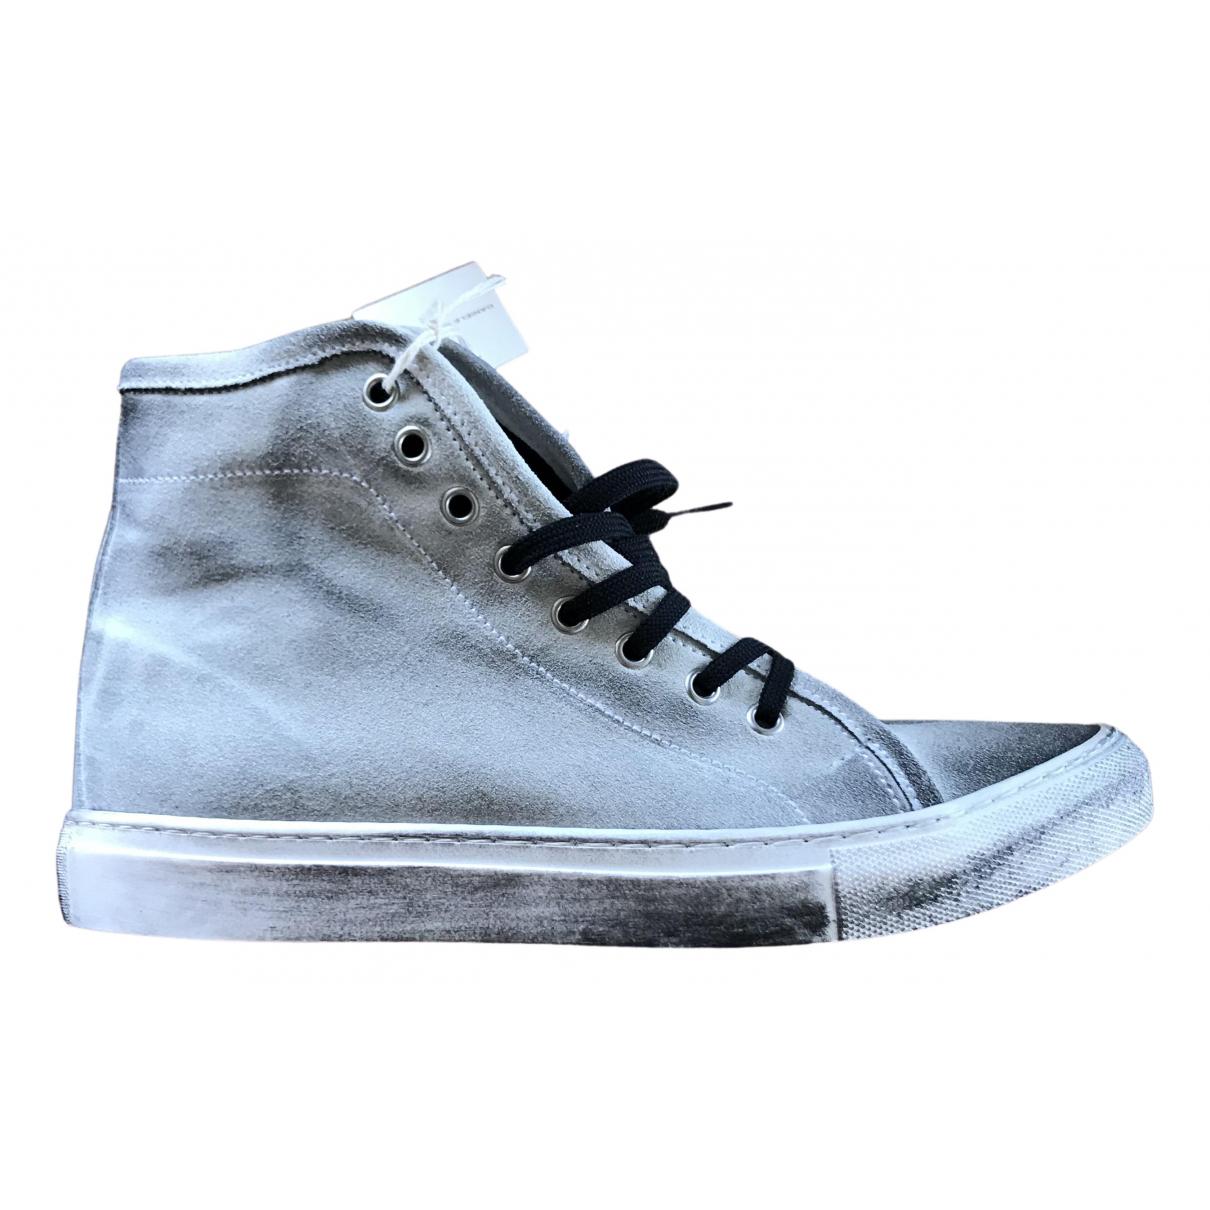 Daniele Alessandrini \N Sneakers in  Weiss Leder